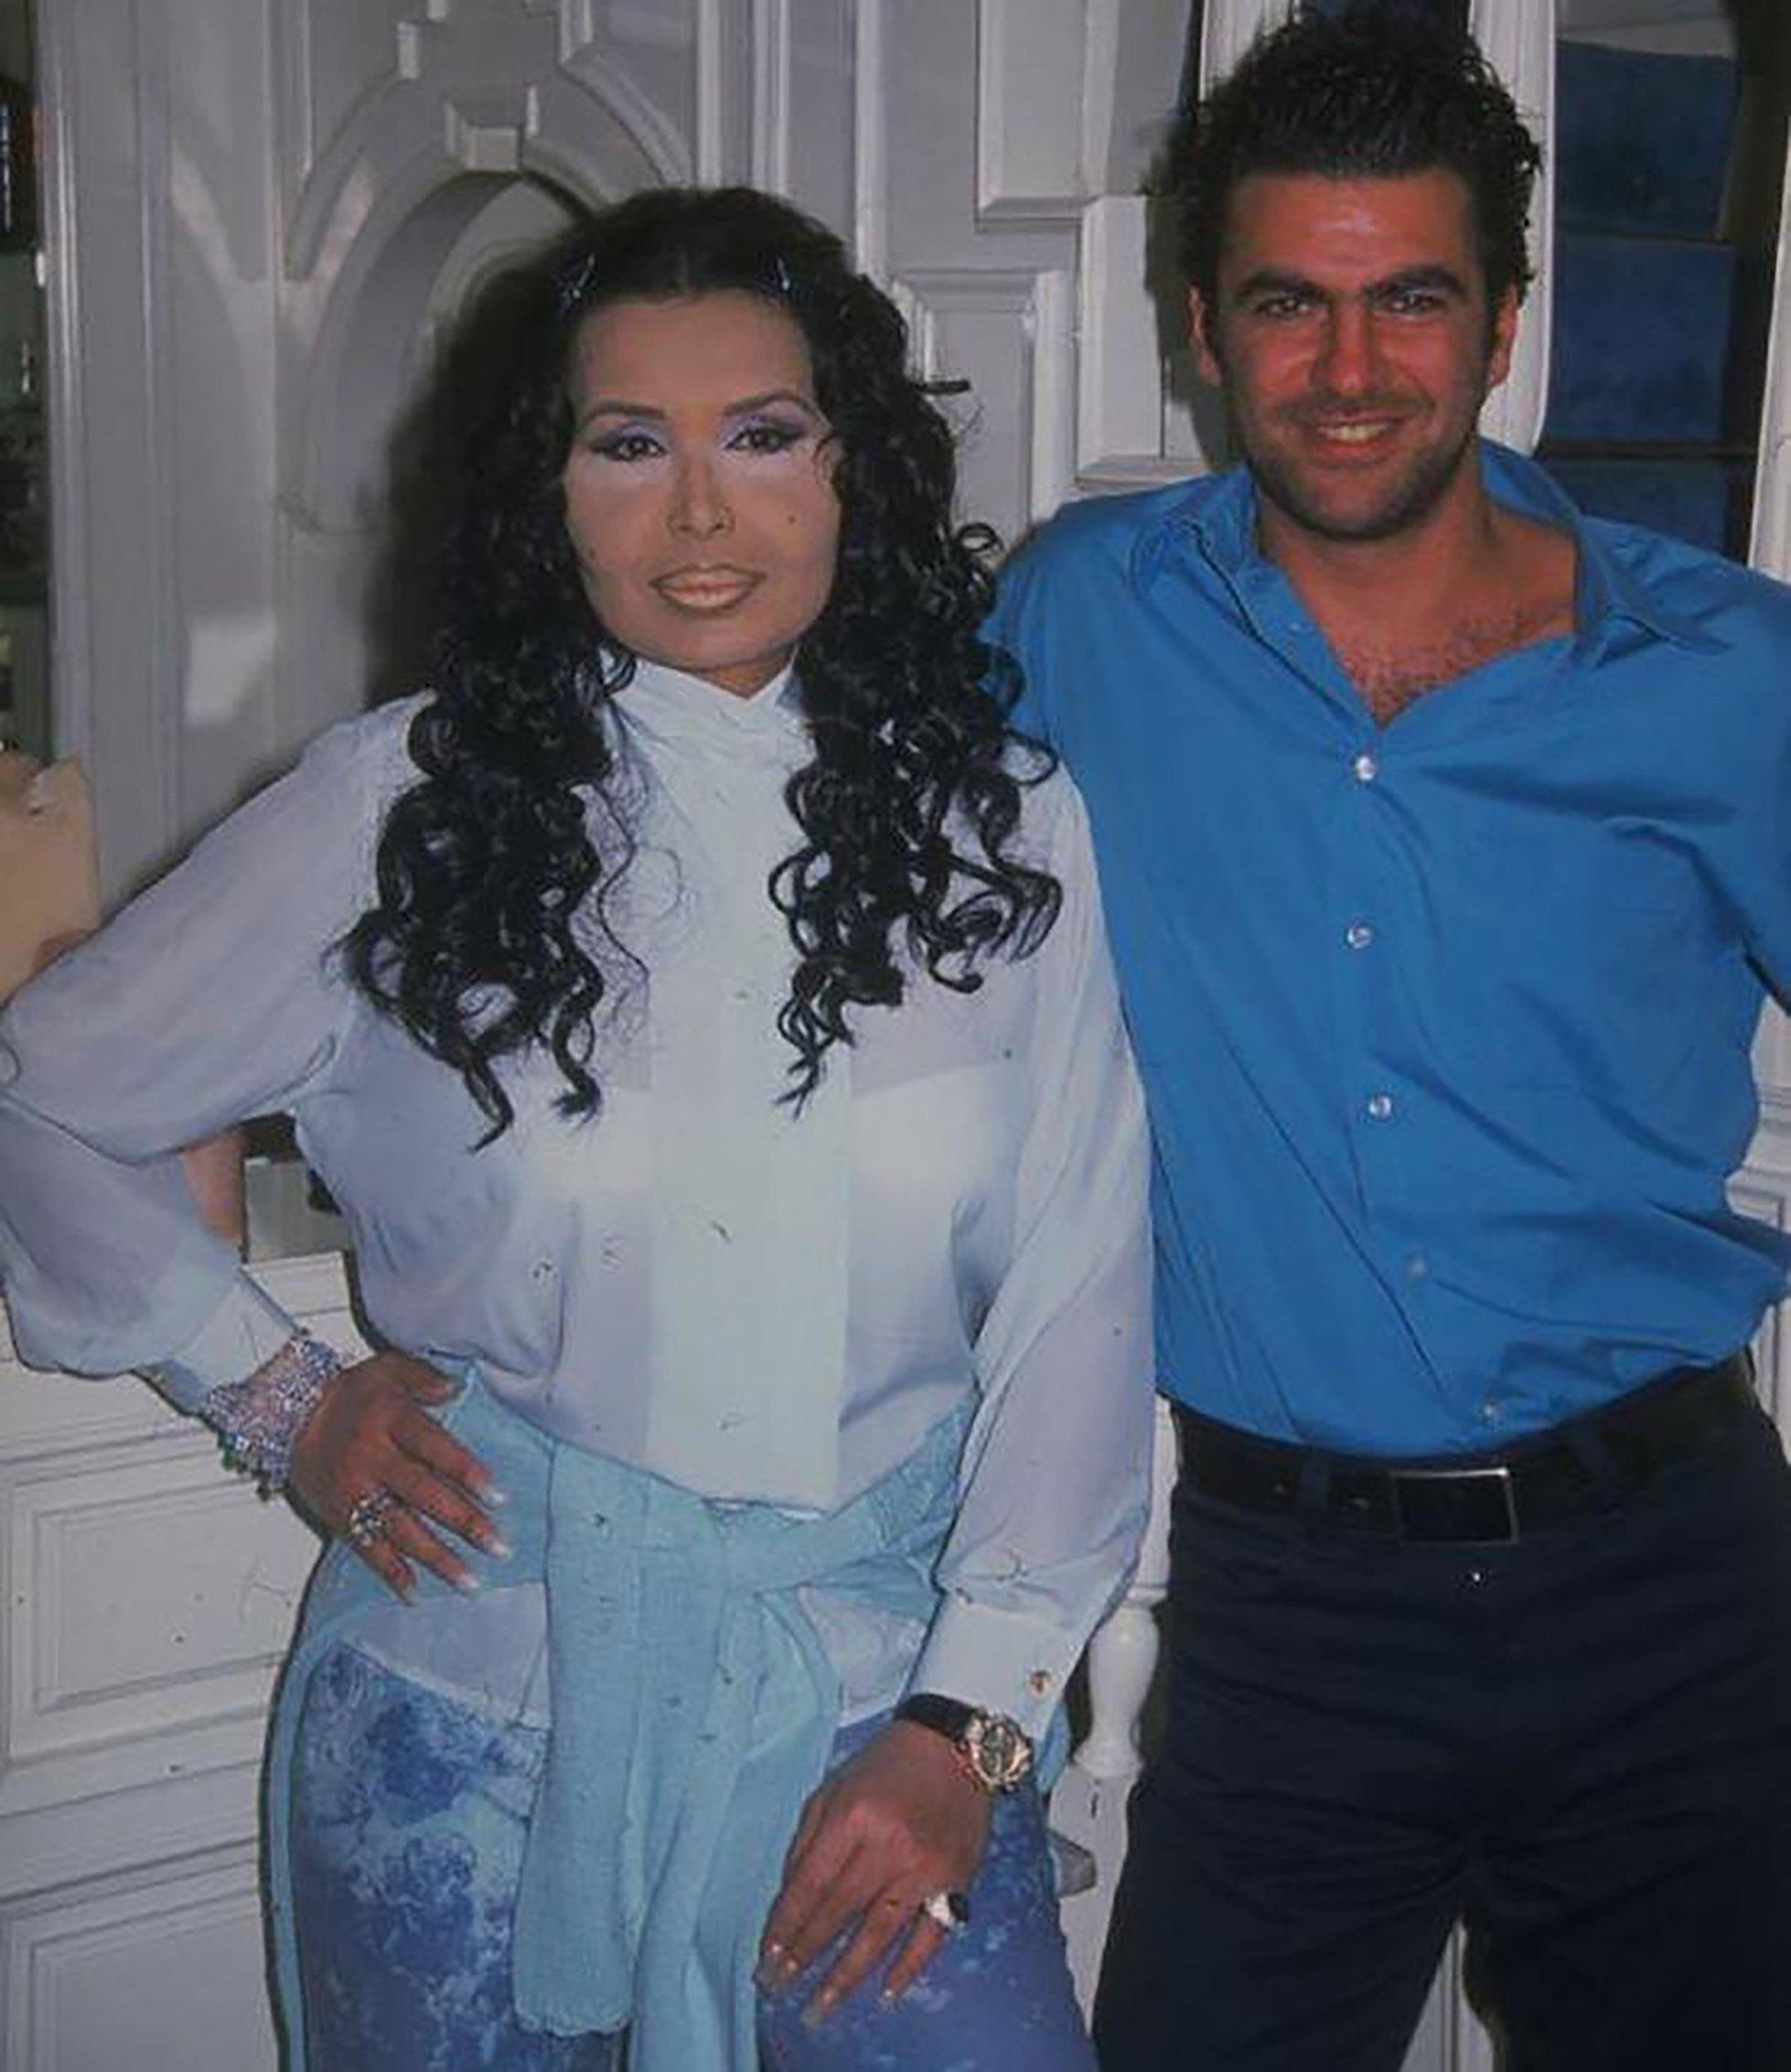 Bülent Ersoy (L) and Turkish model Karahan Çantayposefor a photograph. (Archive Photo)